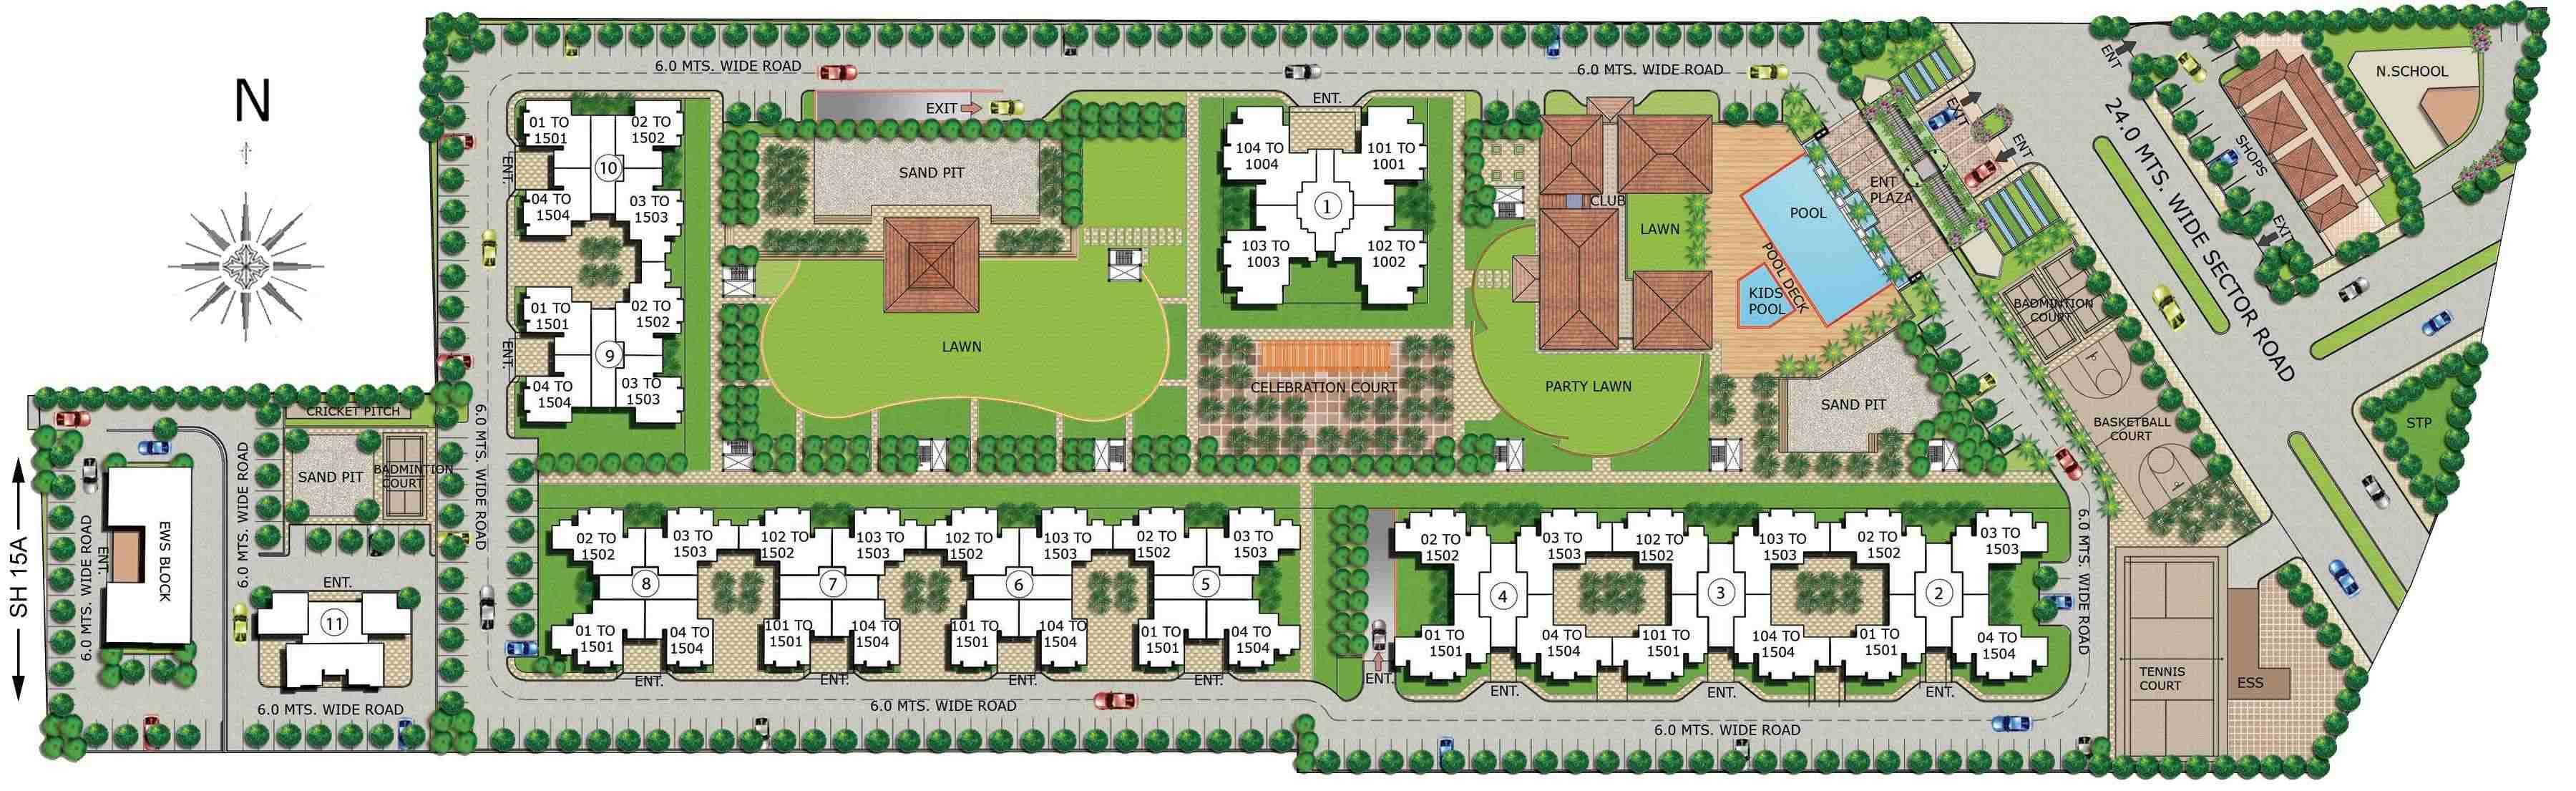 Real Estate Gurgaon Projects : Lavanya